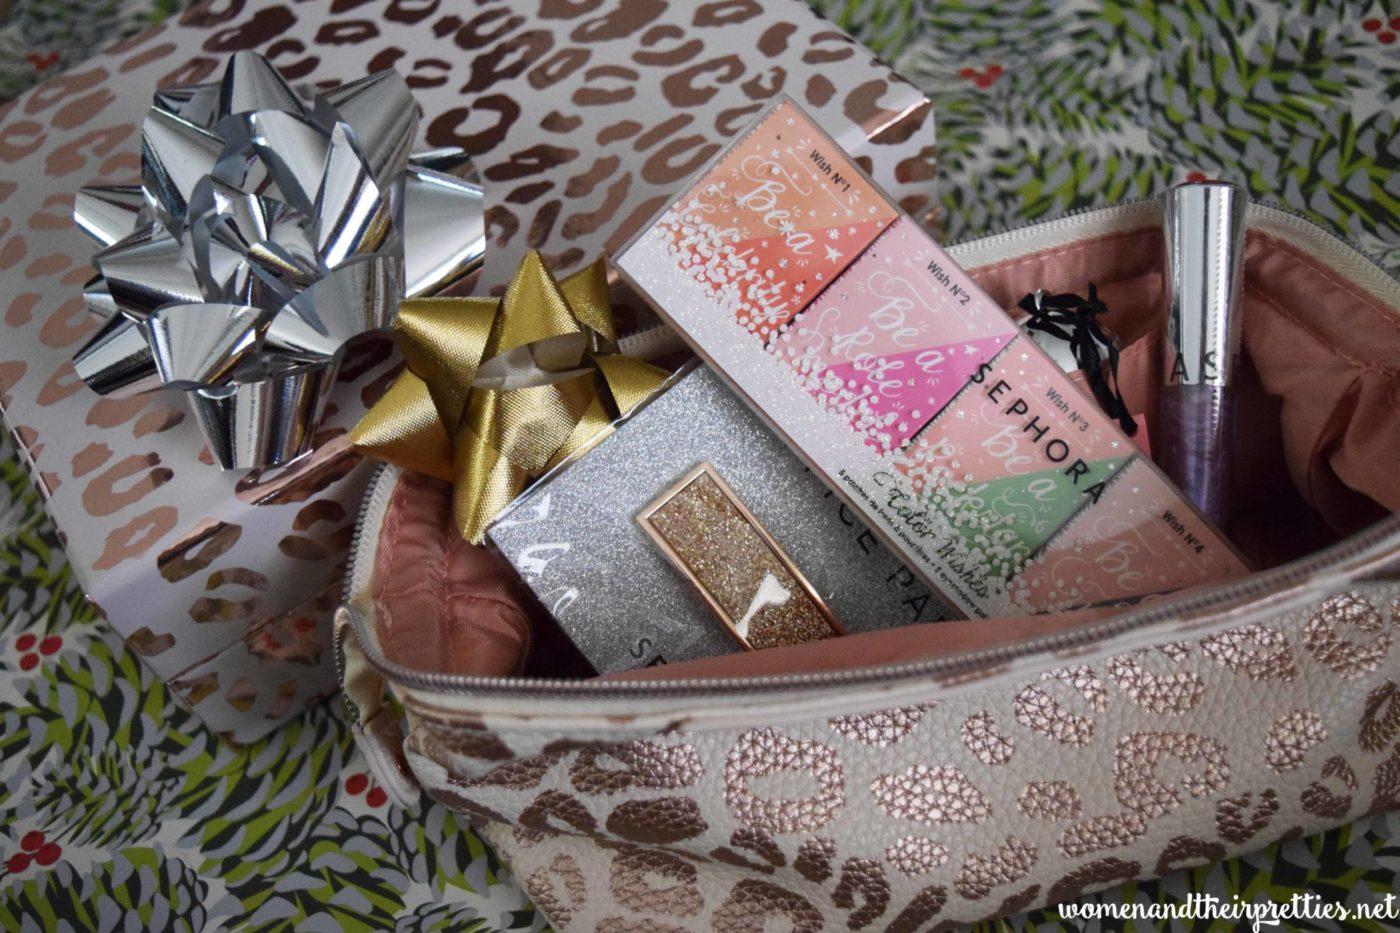 Holiday Gifts Sephora #Beauty #GiftsForHer #StockingStuffers